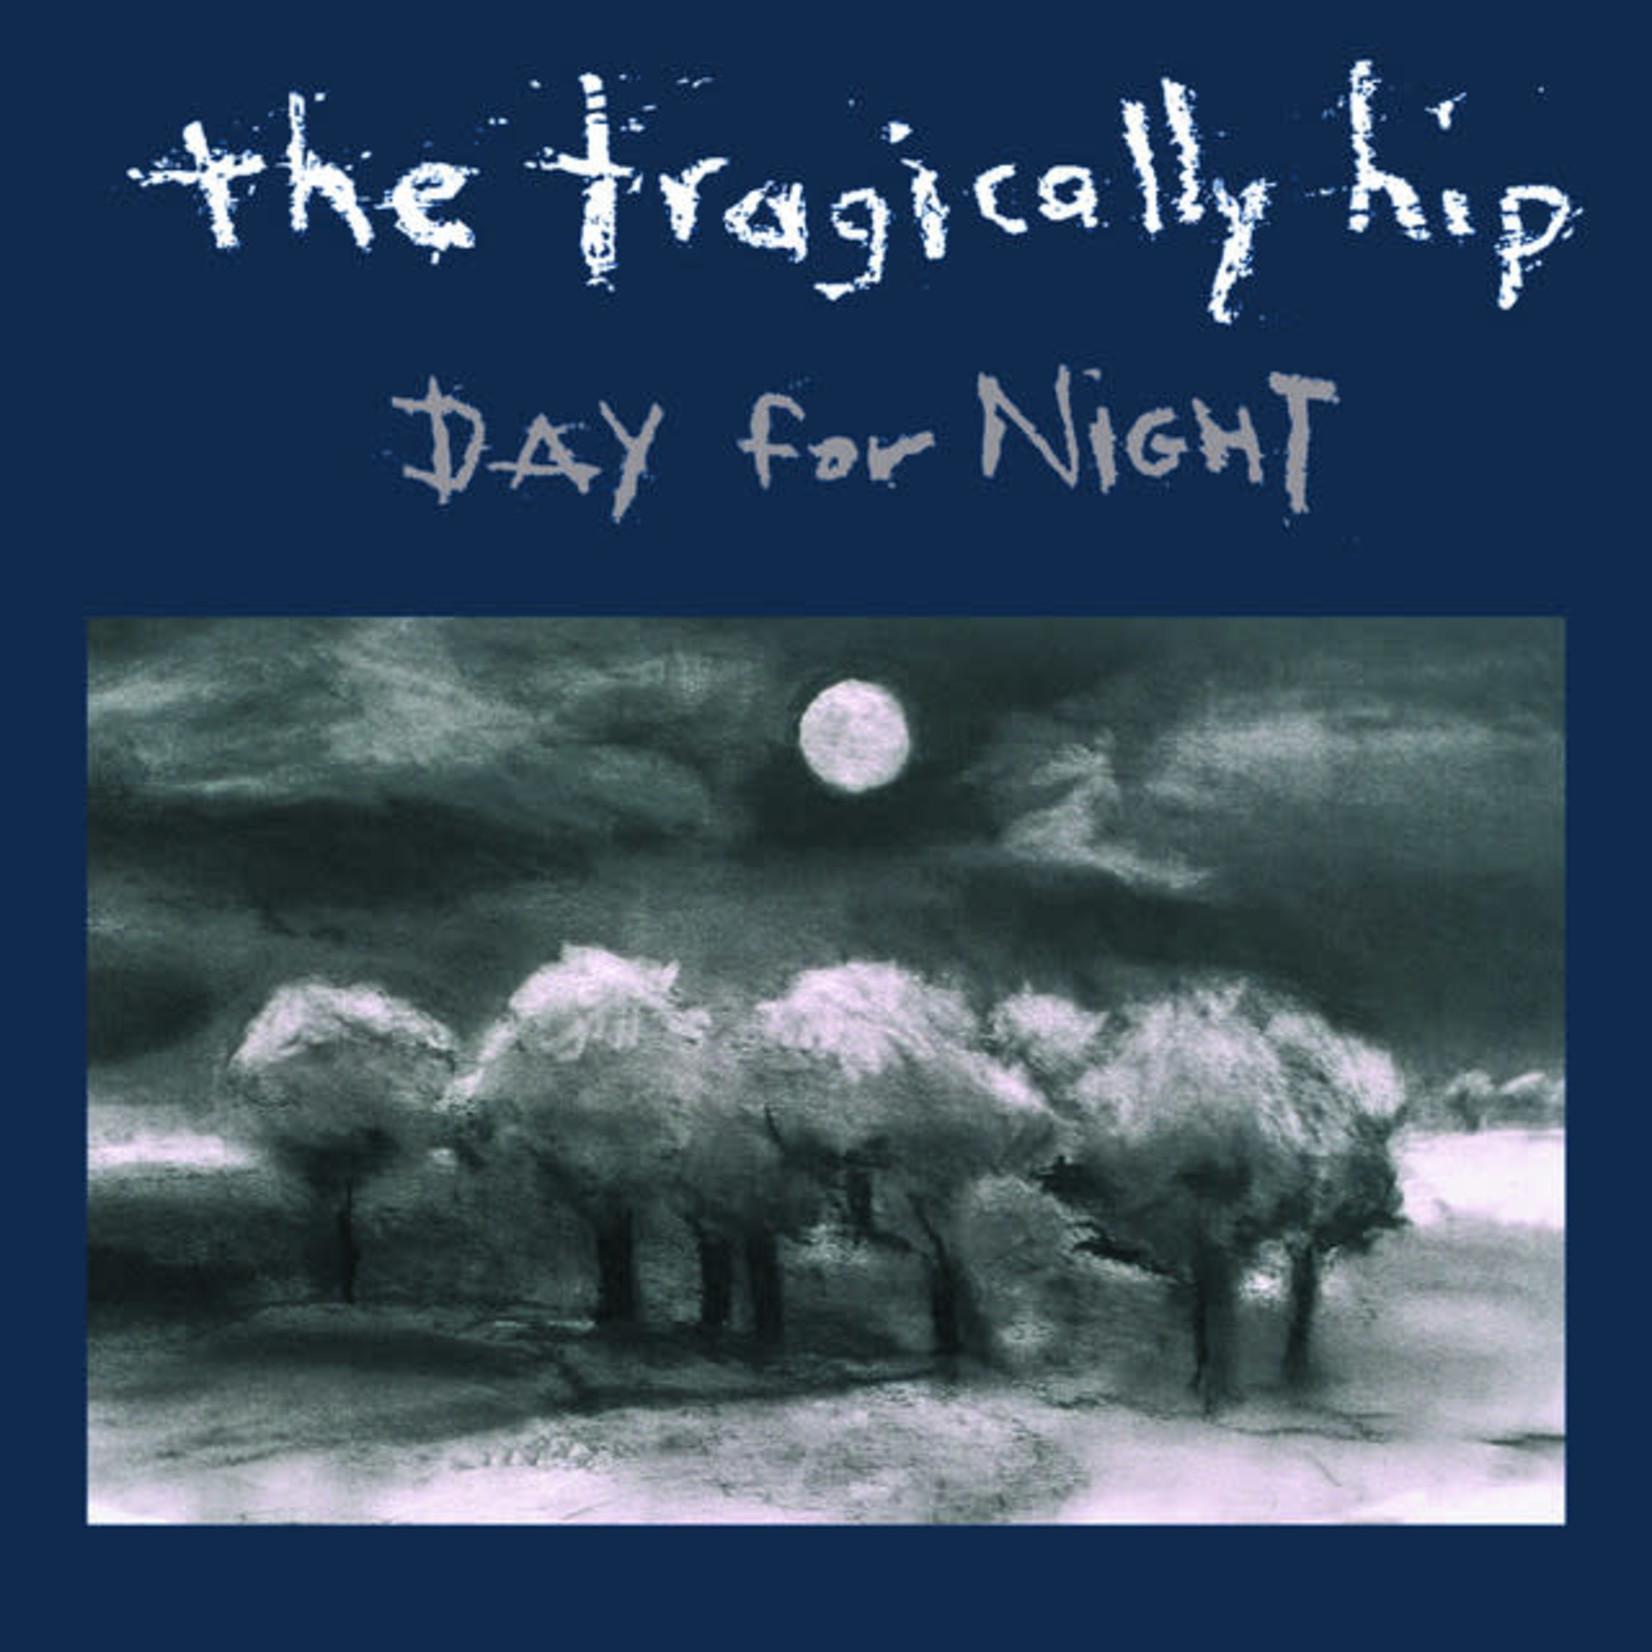 Vinyl Tragically Hip - Day For Night